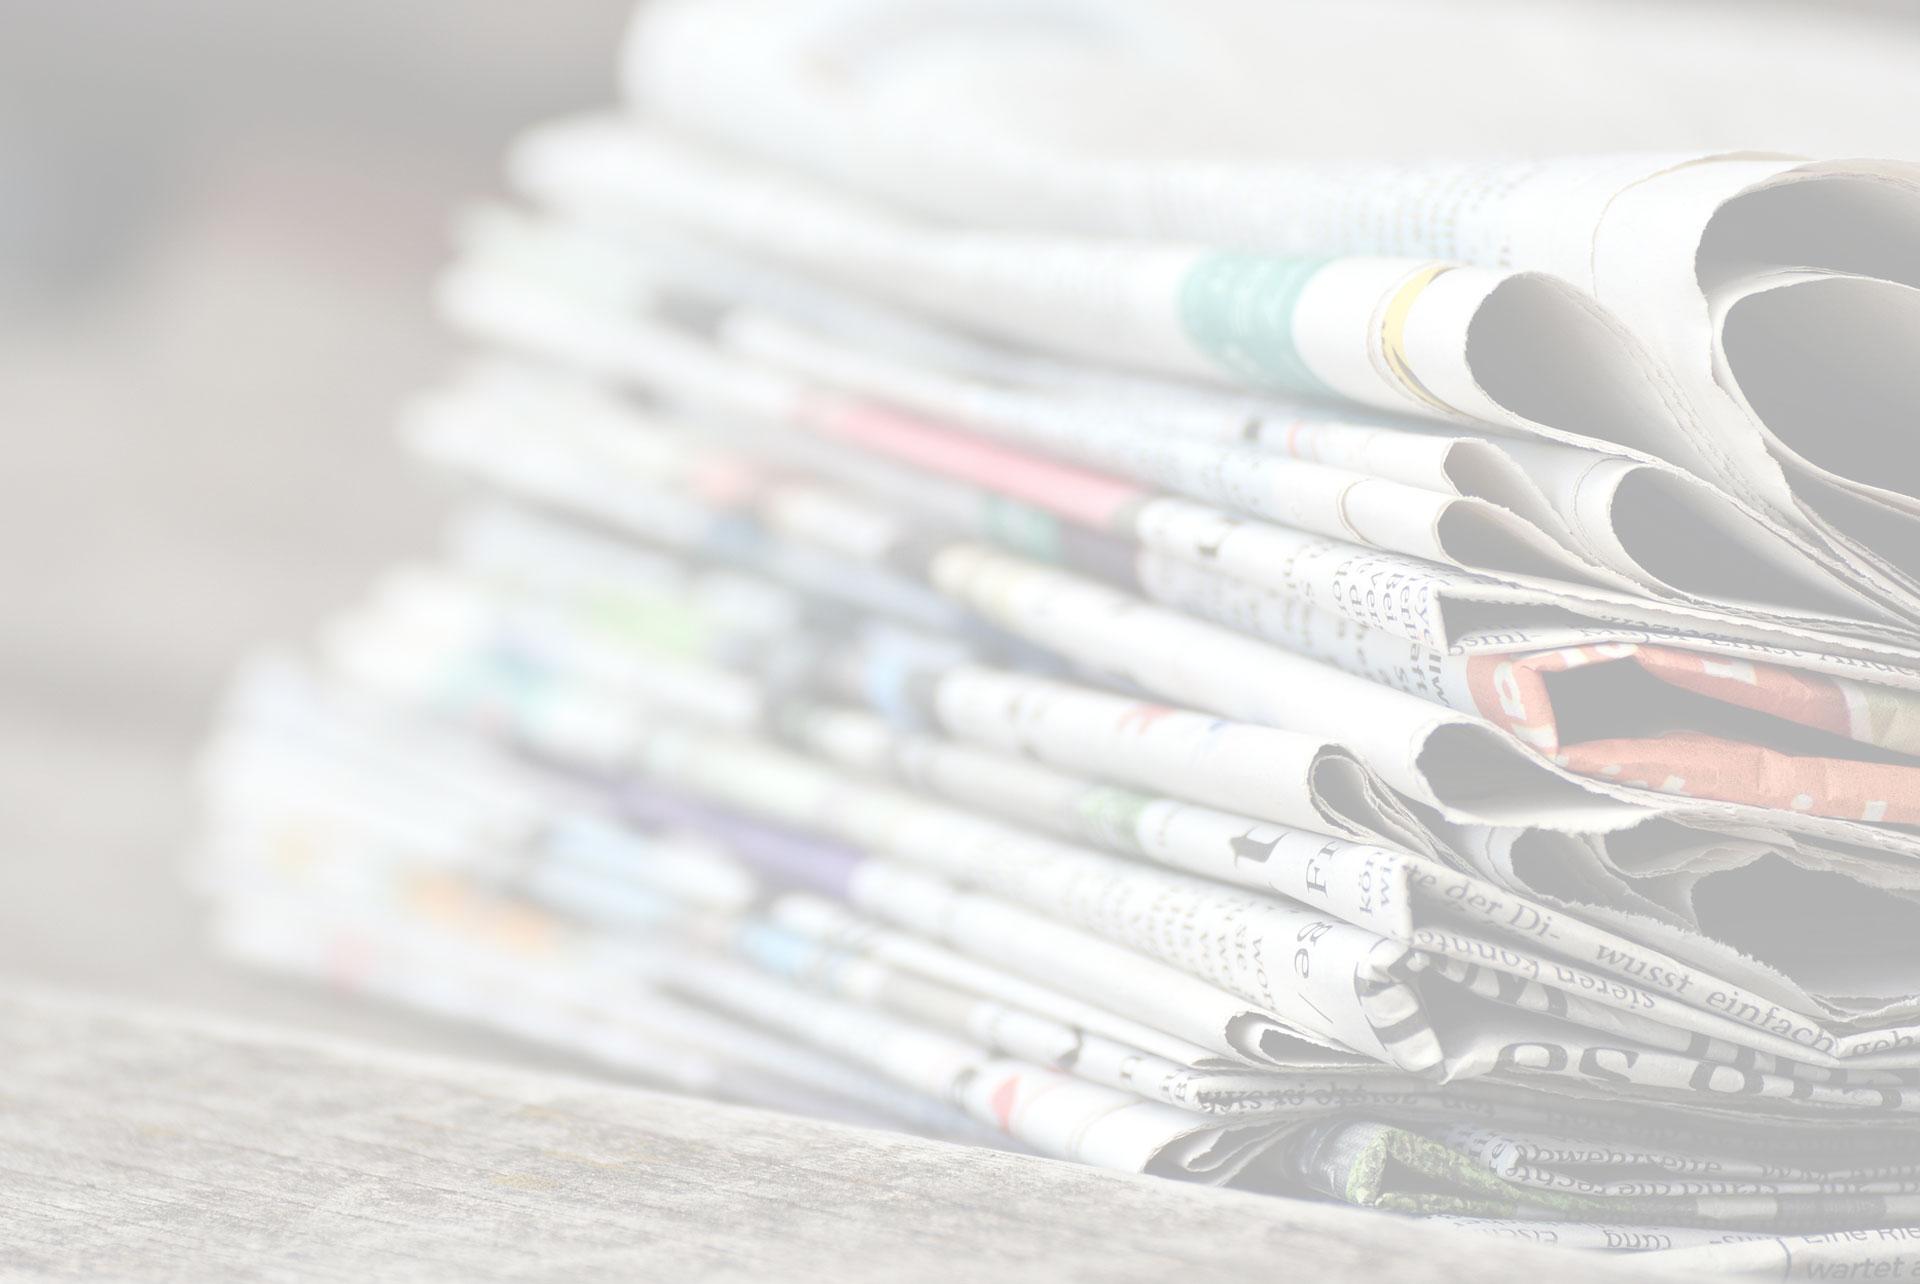 Matteo Salvini sbarchi